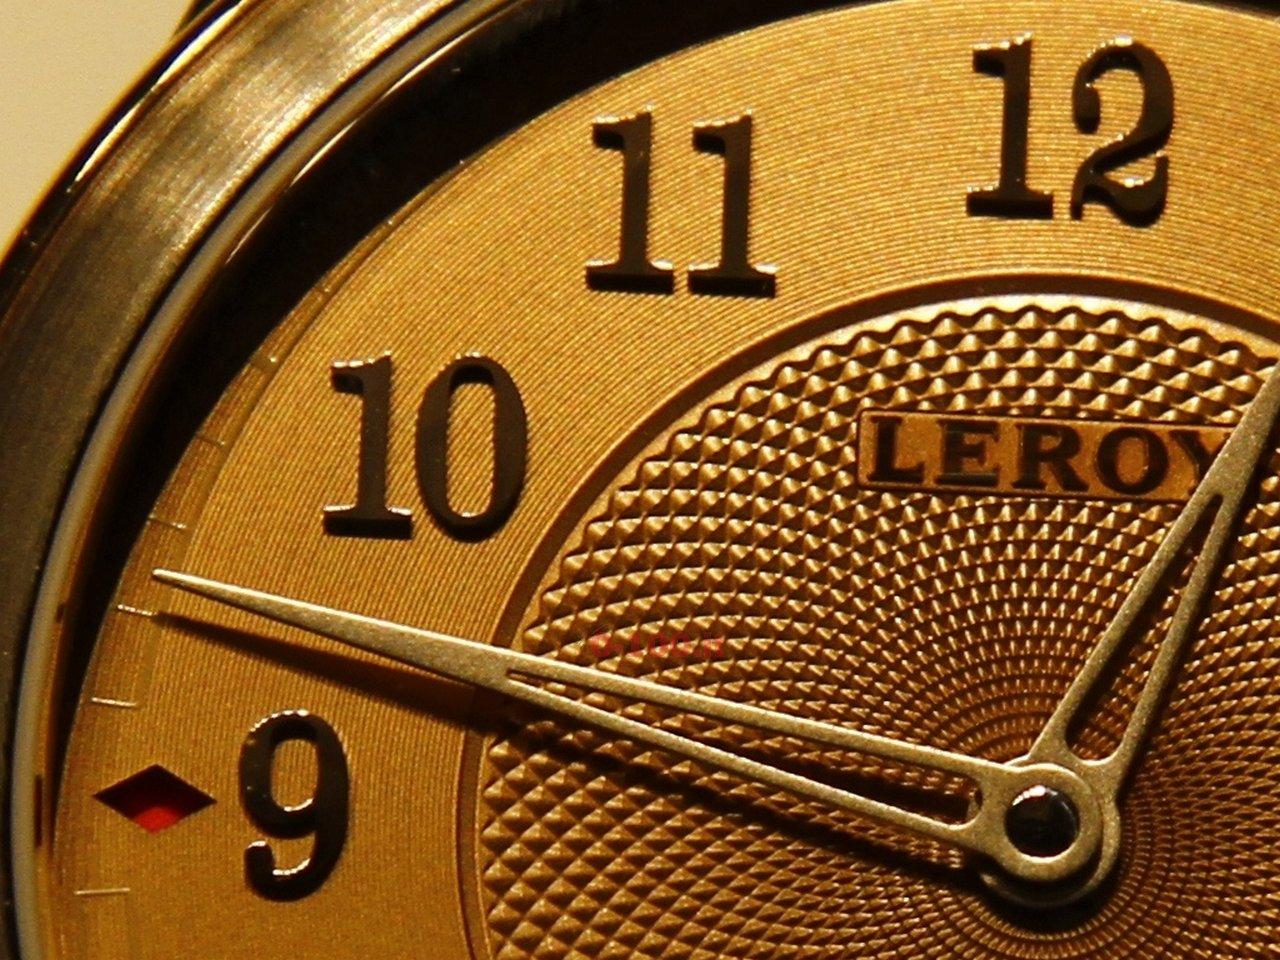 baselworld-2015_leroy-chronometer-l200-0-100-12